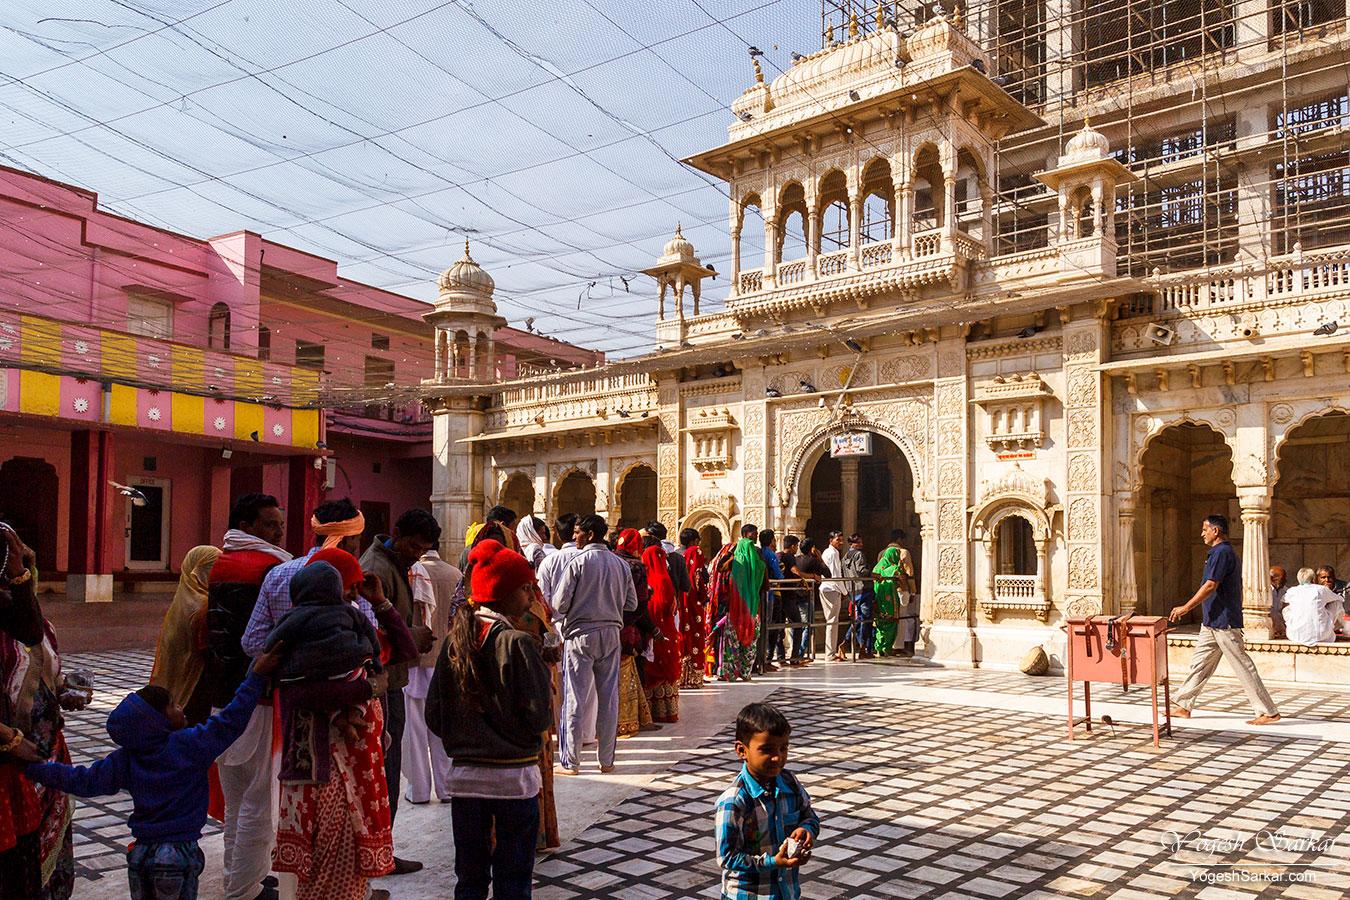 21-crowd-at-karni-mata-temple.jpg